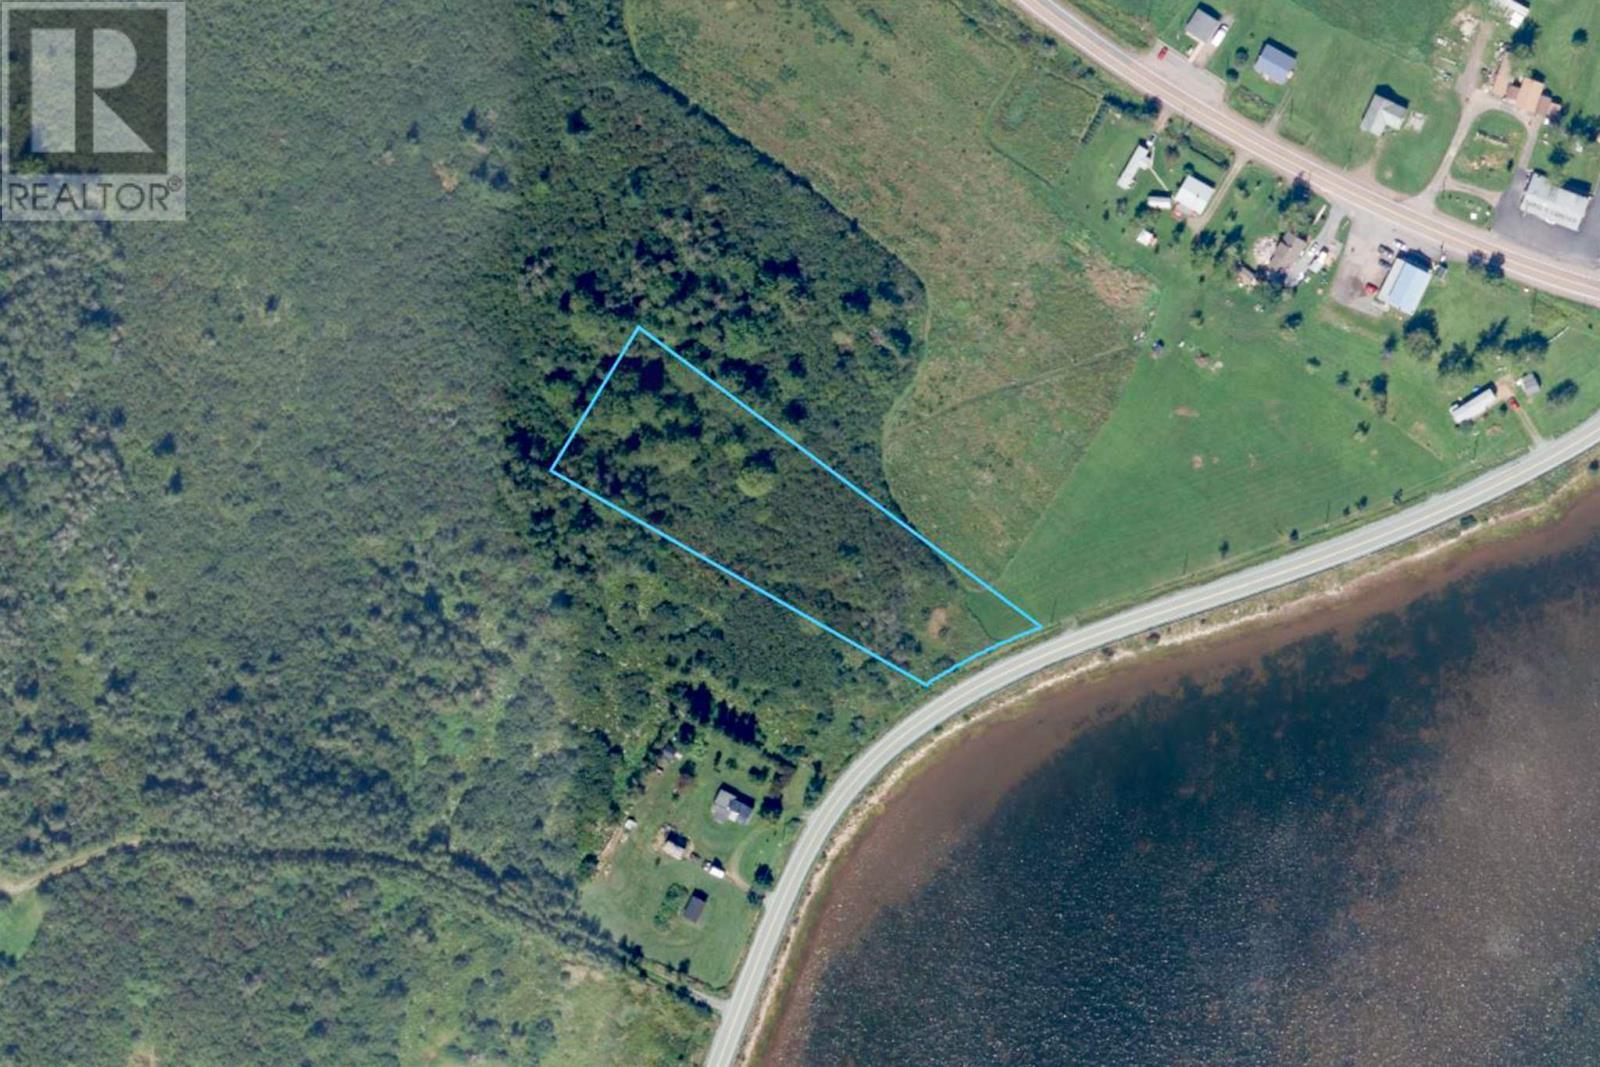 Lot 19-1 Kolbec Road, Port Howe, Nova Scotia  B0K 1K0 - Photo 1 - 202000808